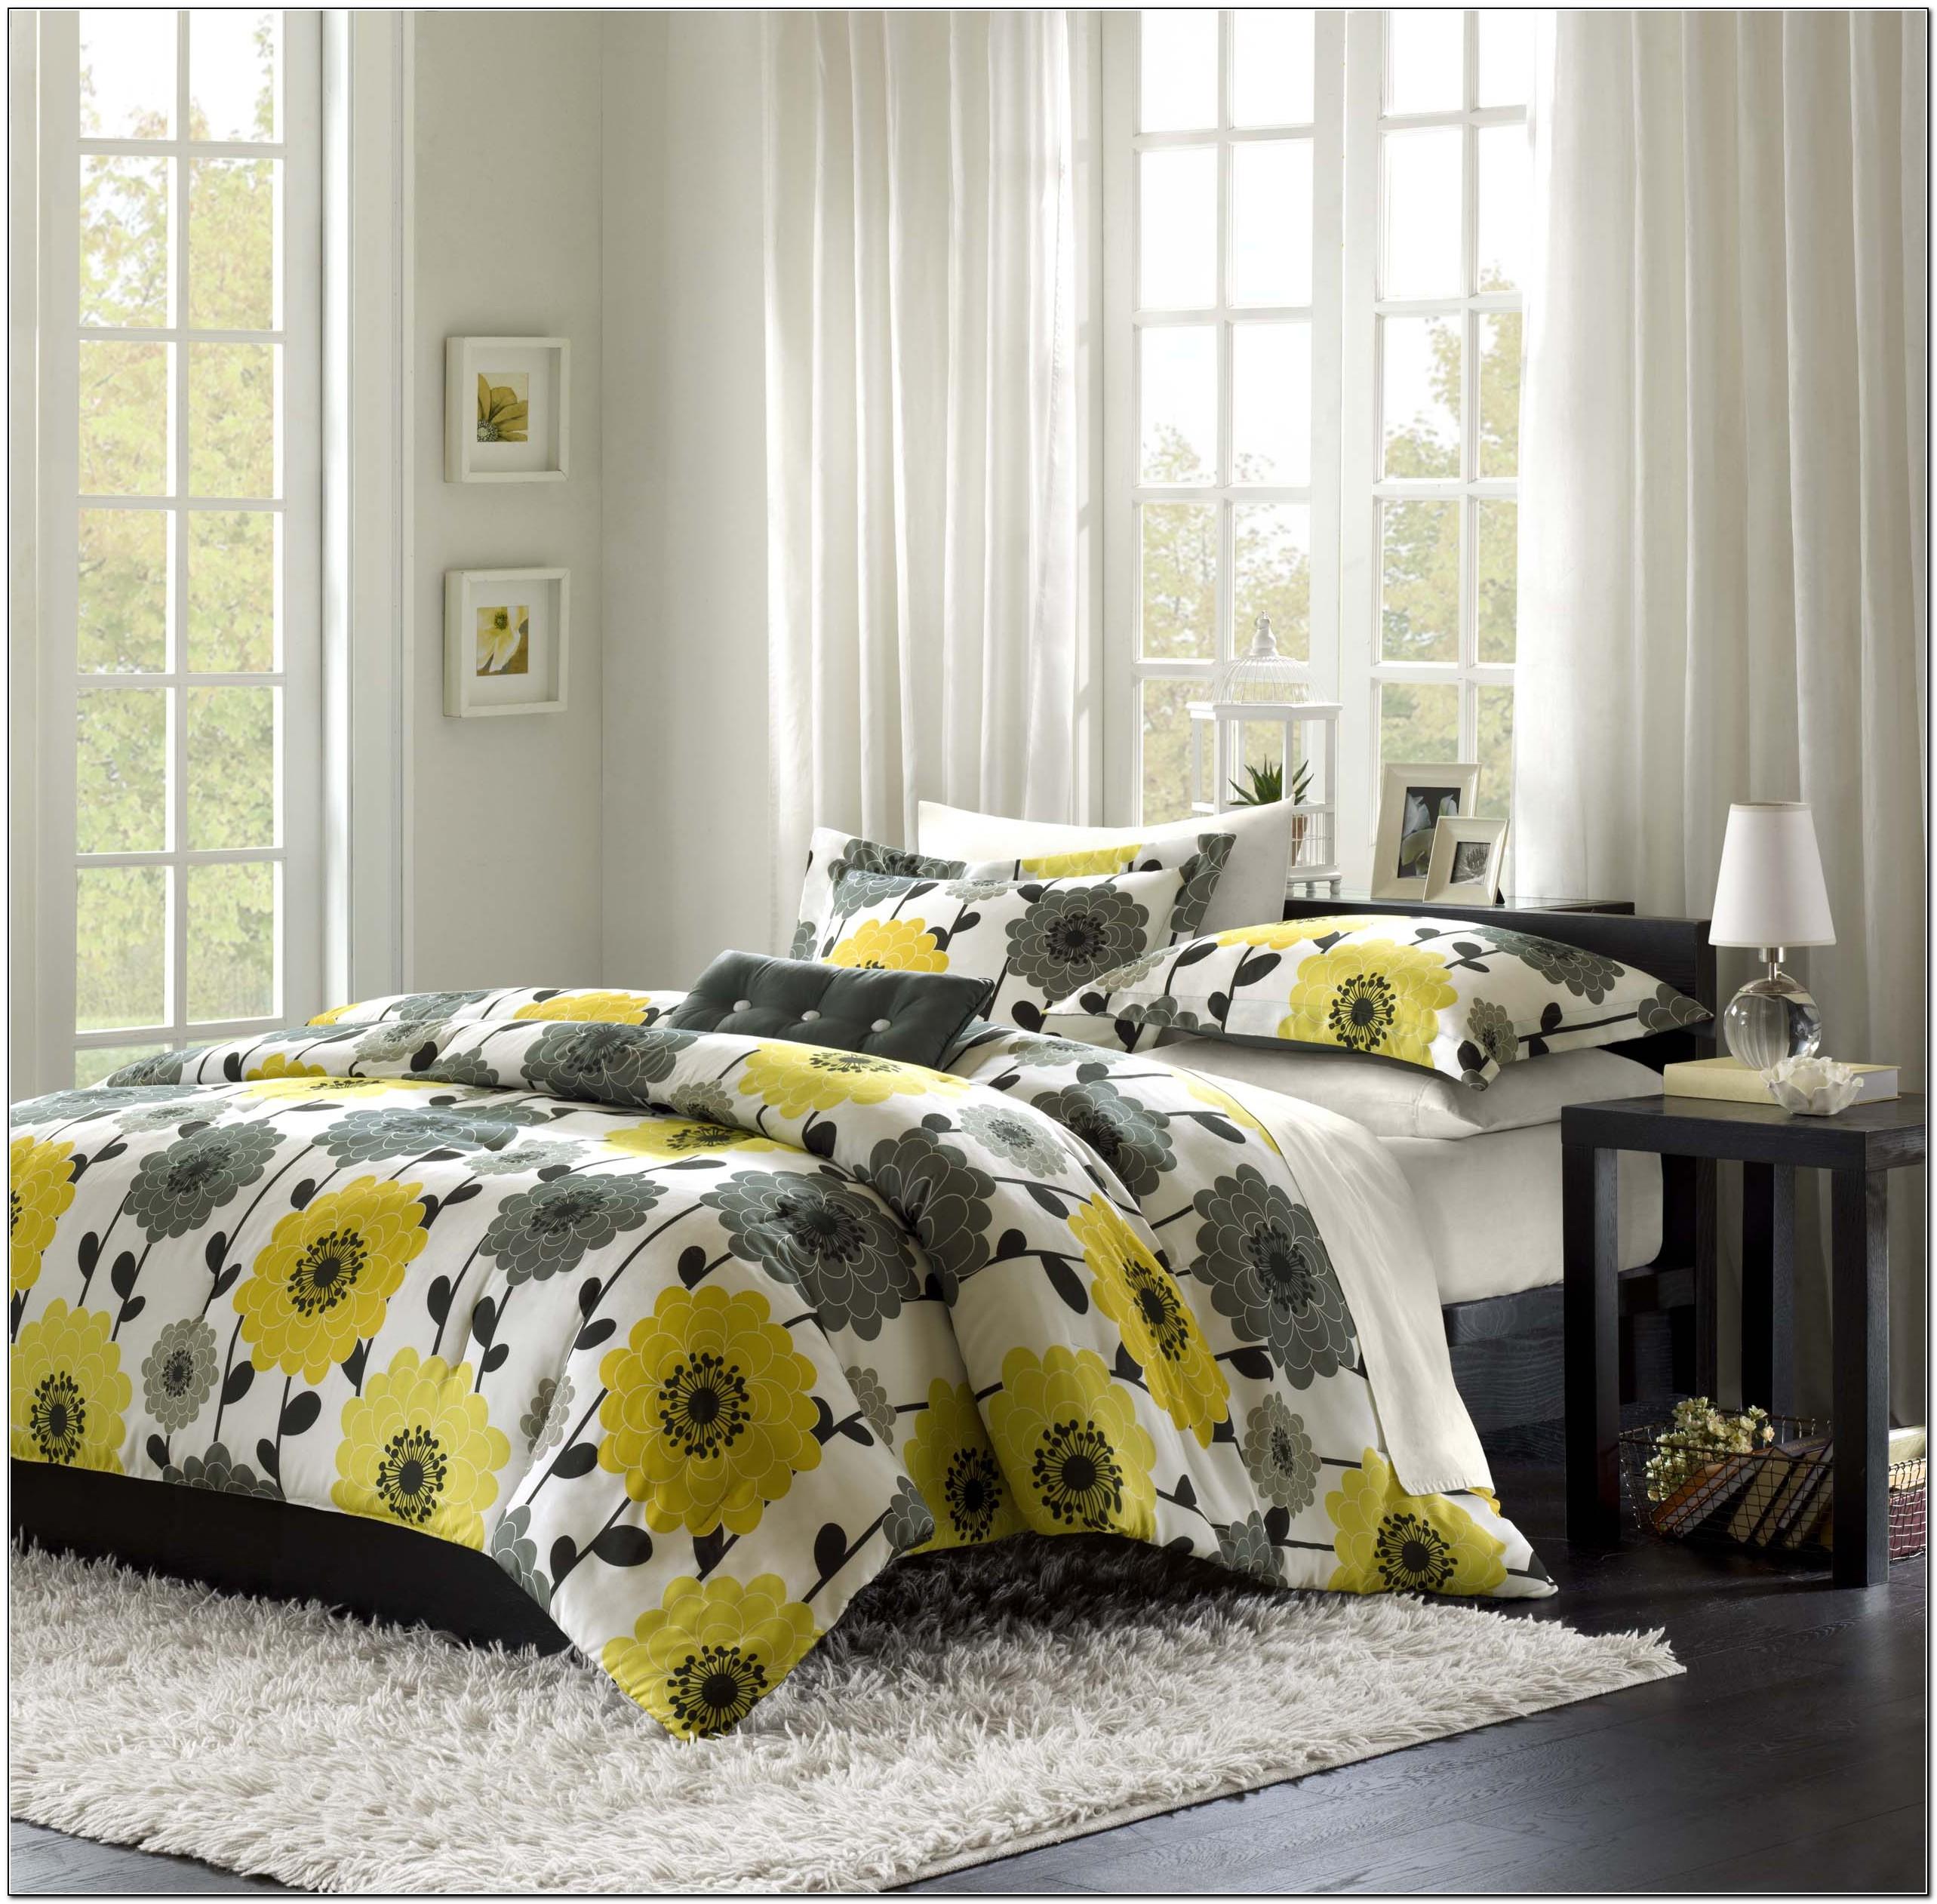 Grey And Yellow Bedding Kohl's